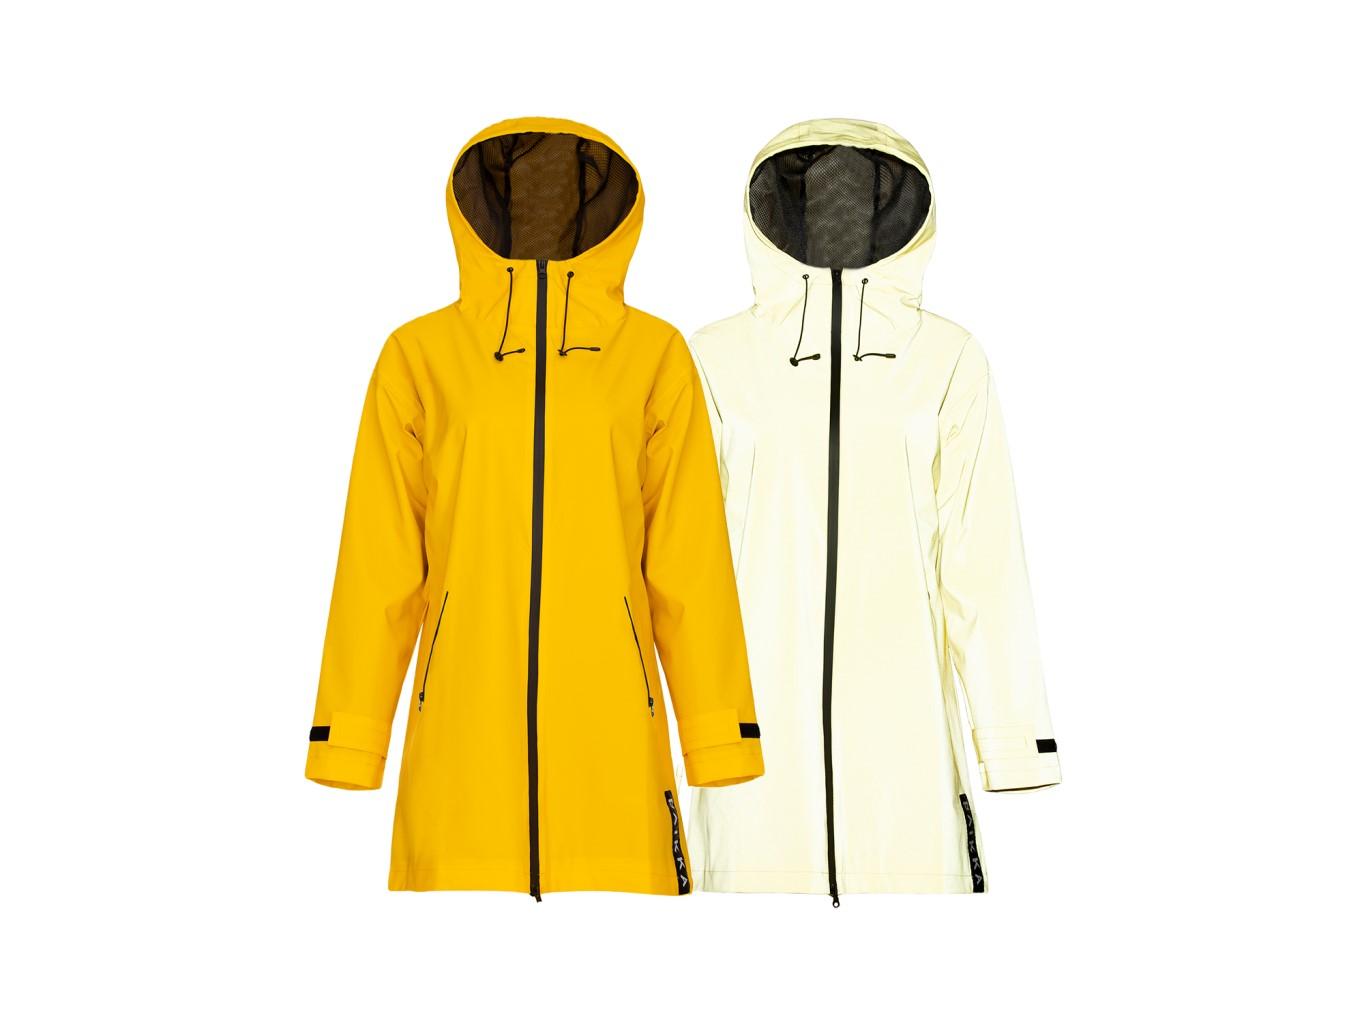 1094001_PAIKKA_Human_Visibility_Raincoat_yellow_W_refl